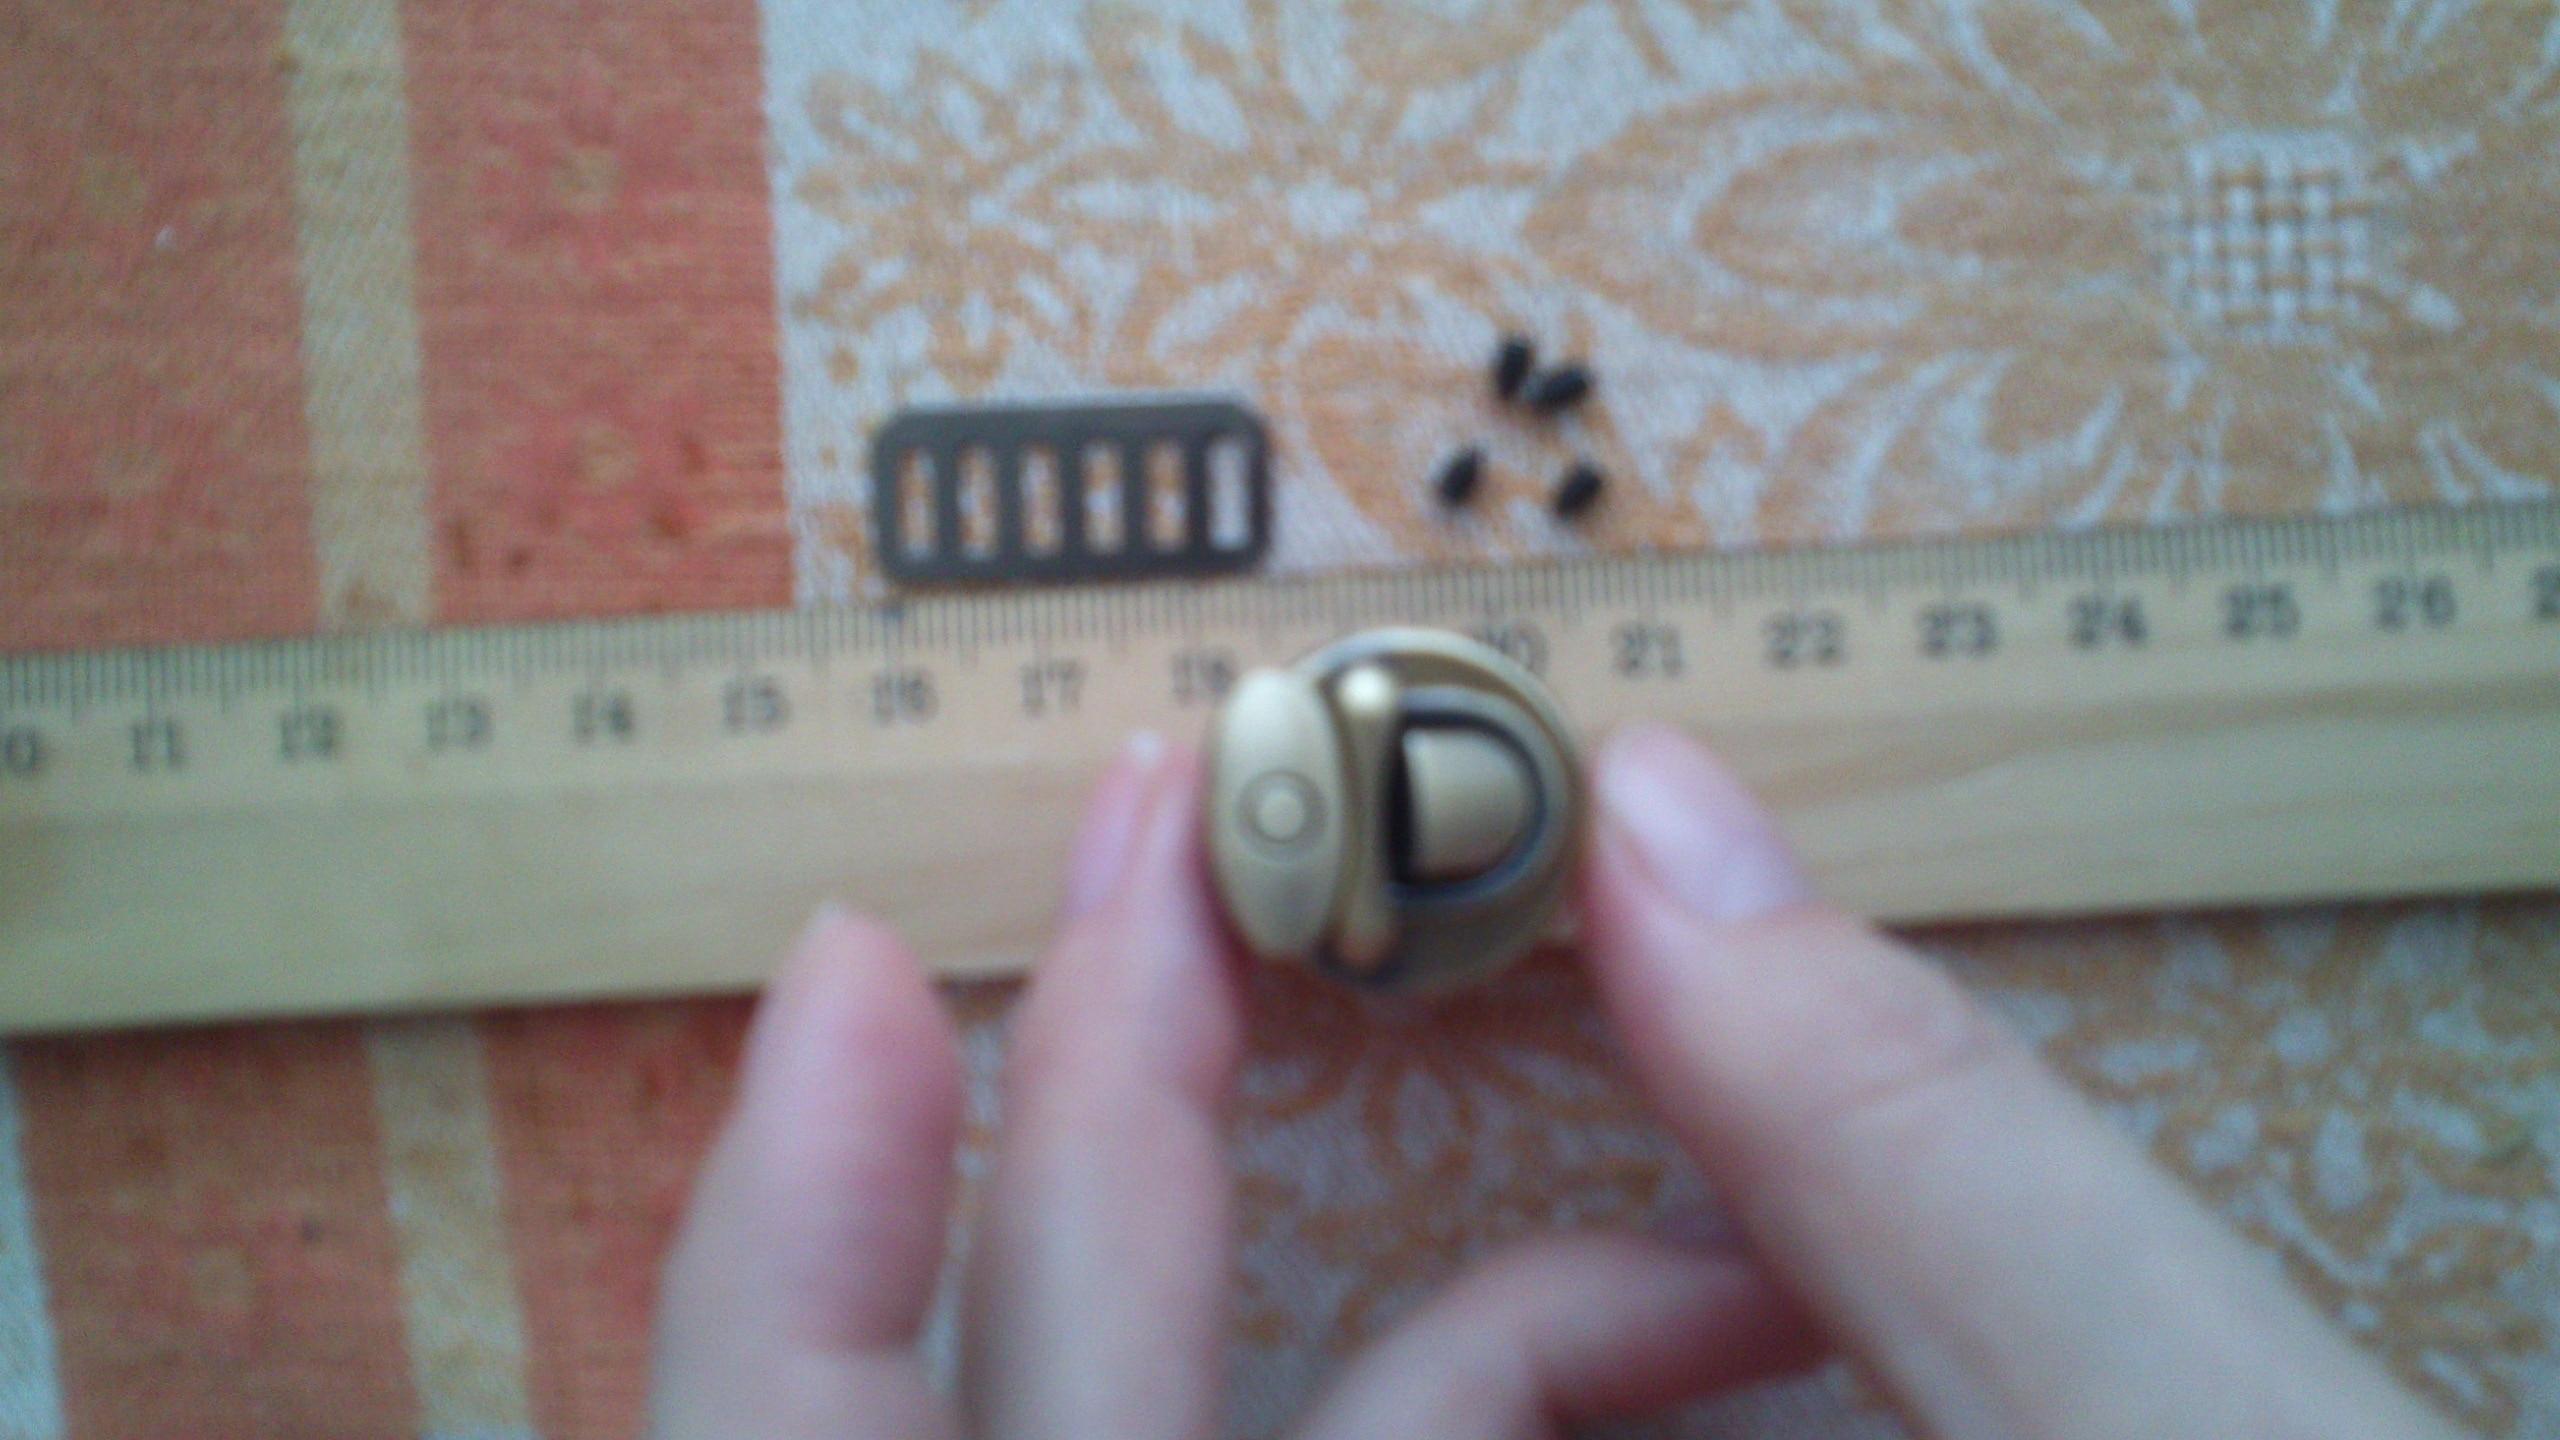 Osmond Alloy Tone Turn Sloten Snap Sluitingen Sluiting Gesp voor Tassen Accessoires DIY Handtassen Purse Alloy Button Replacement Lock photo review